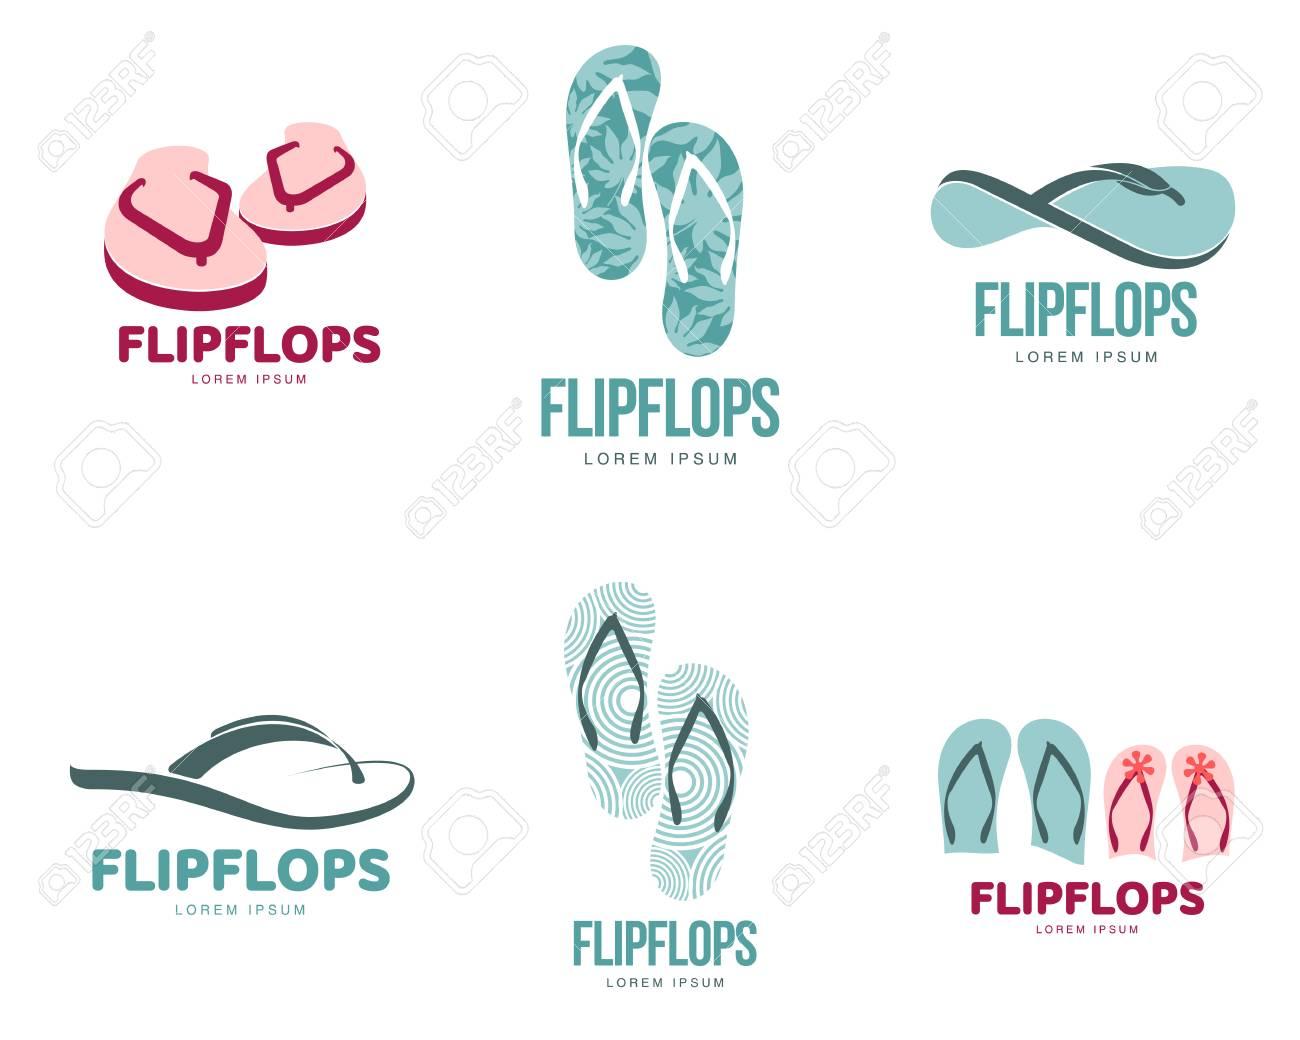 ec2774f577851 Set Of Stylized Black And White Rubber Flip Flops Logo Templates ...